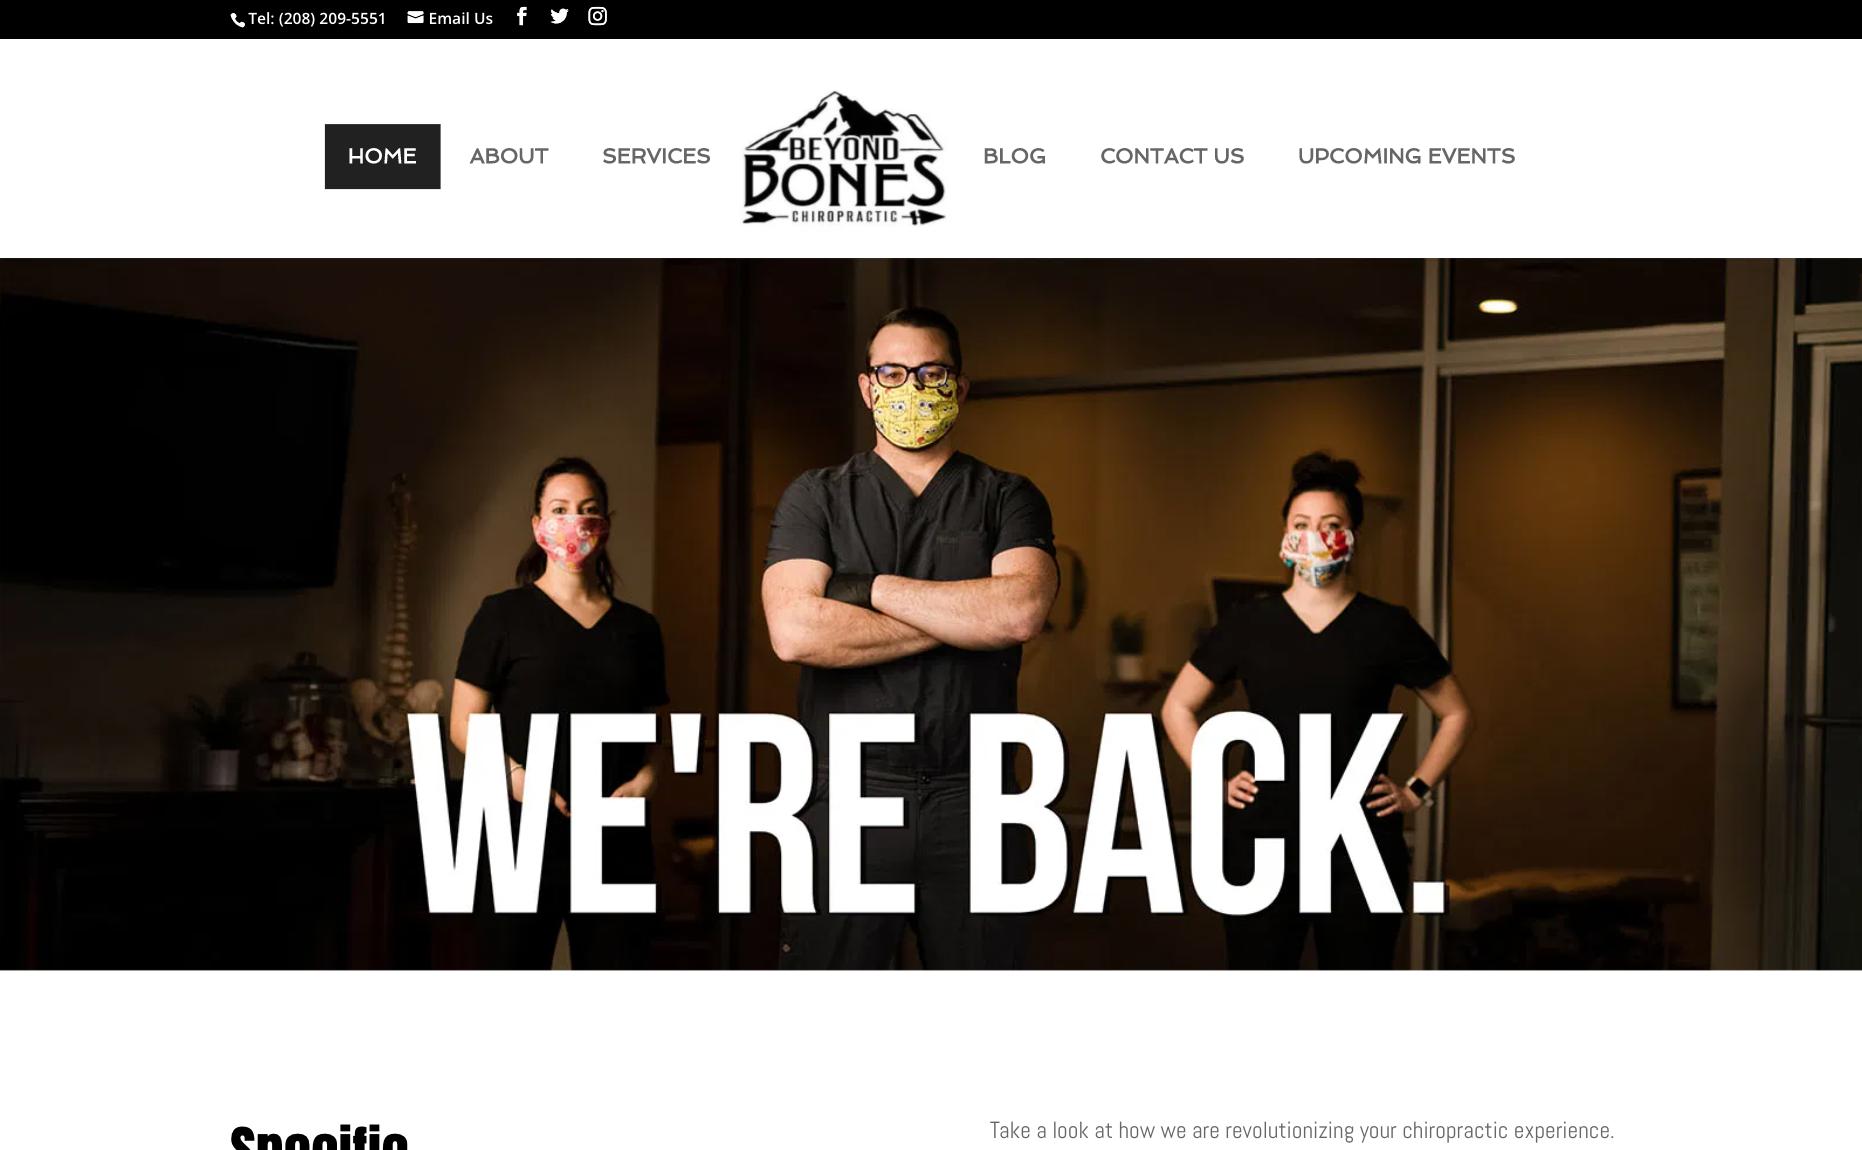 We're back website screenshot